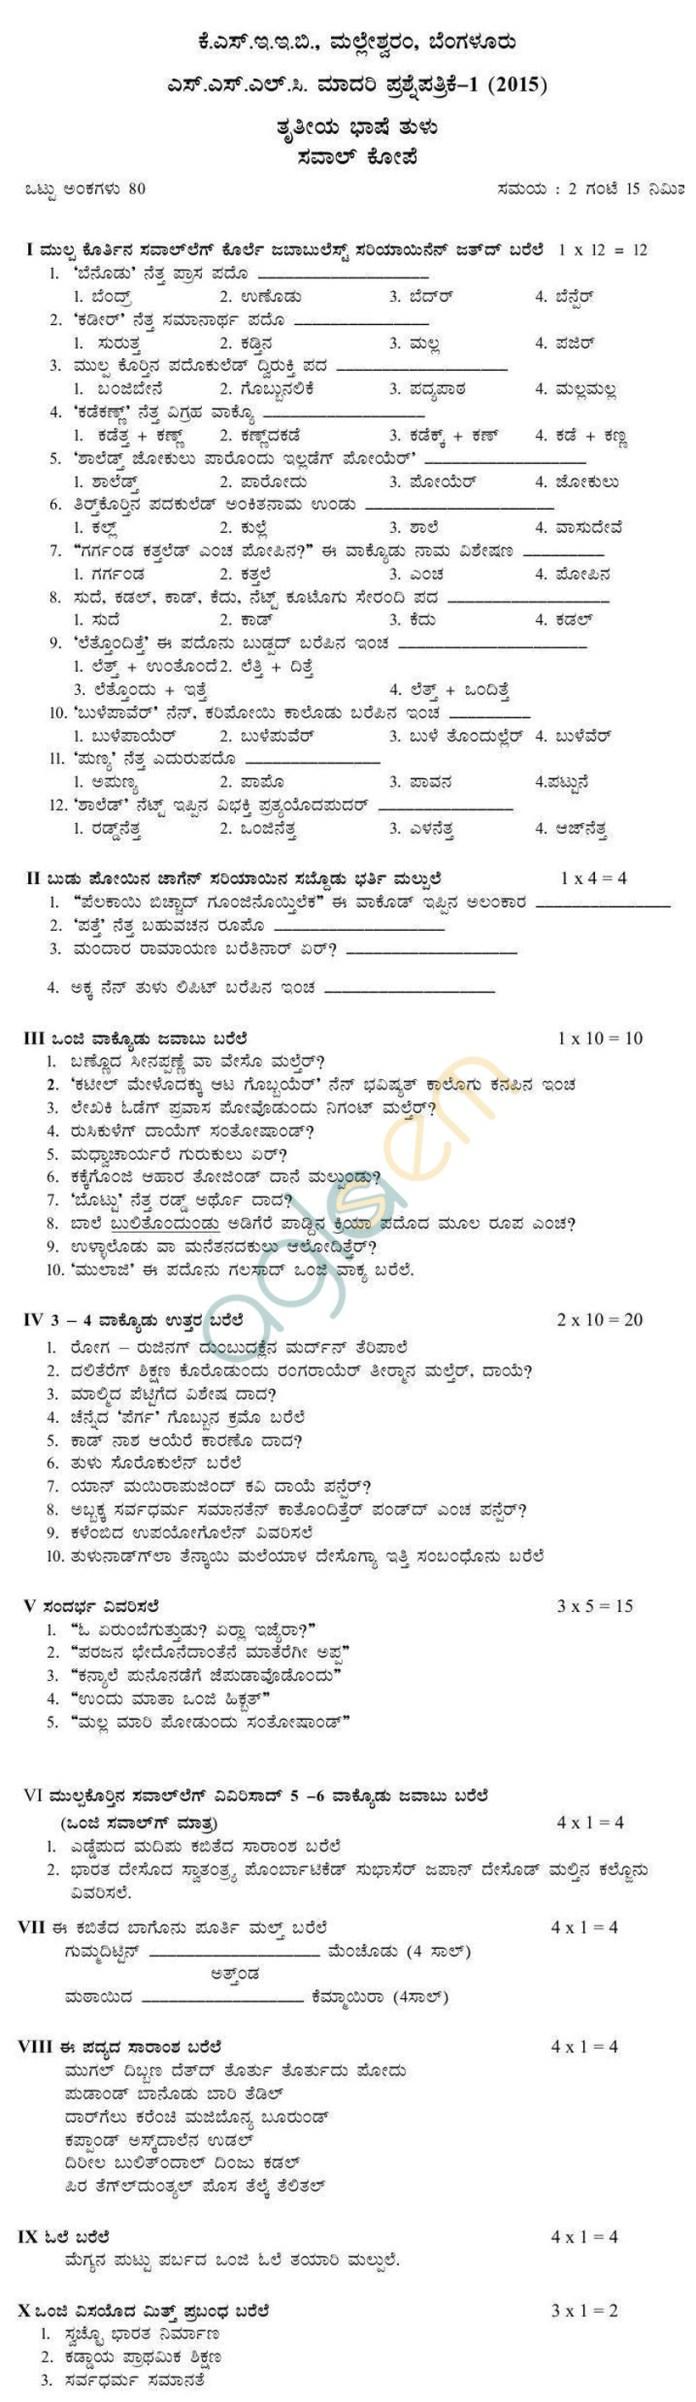 Karnataka Board SSLC Model Question Papers 2015 forTulu (III)